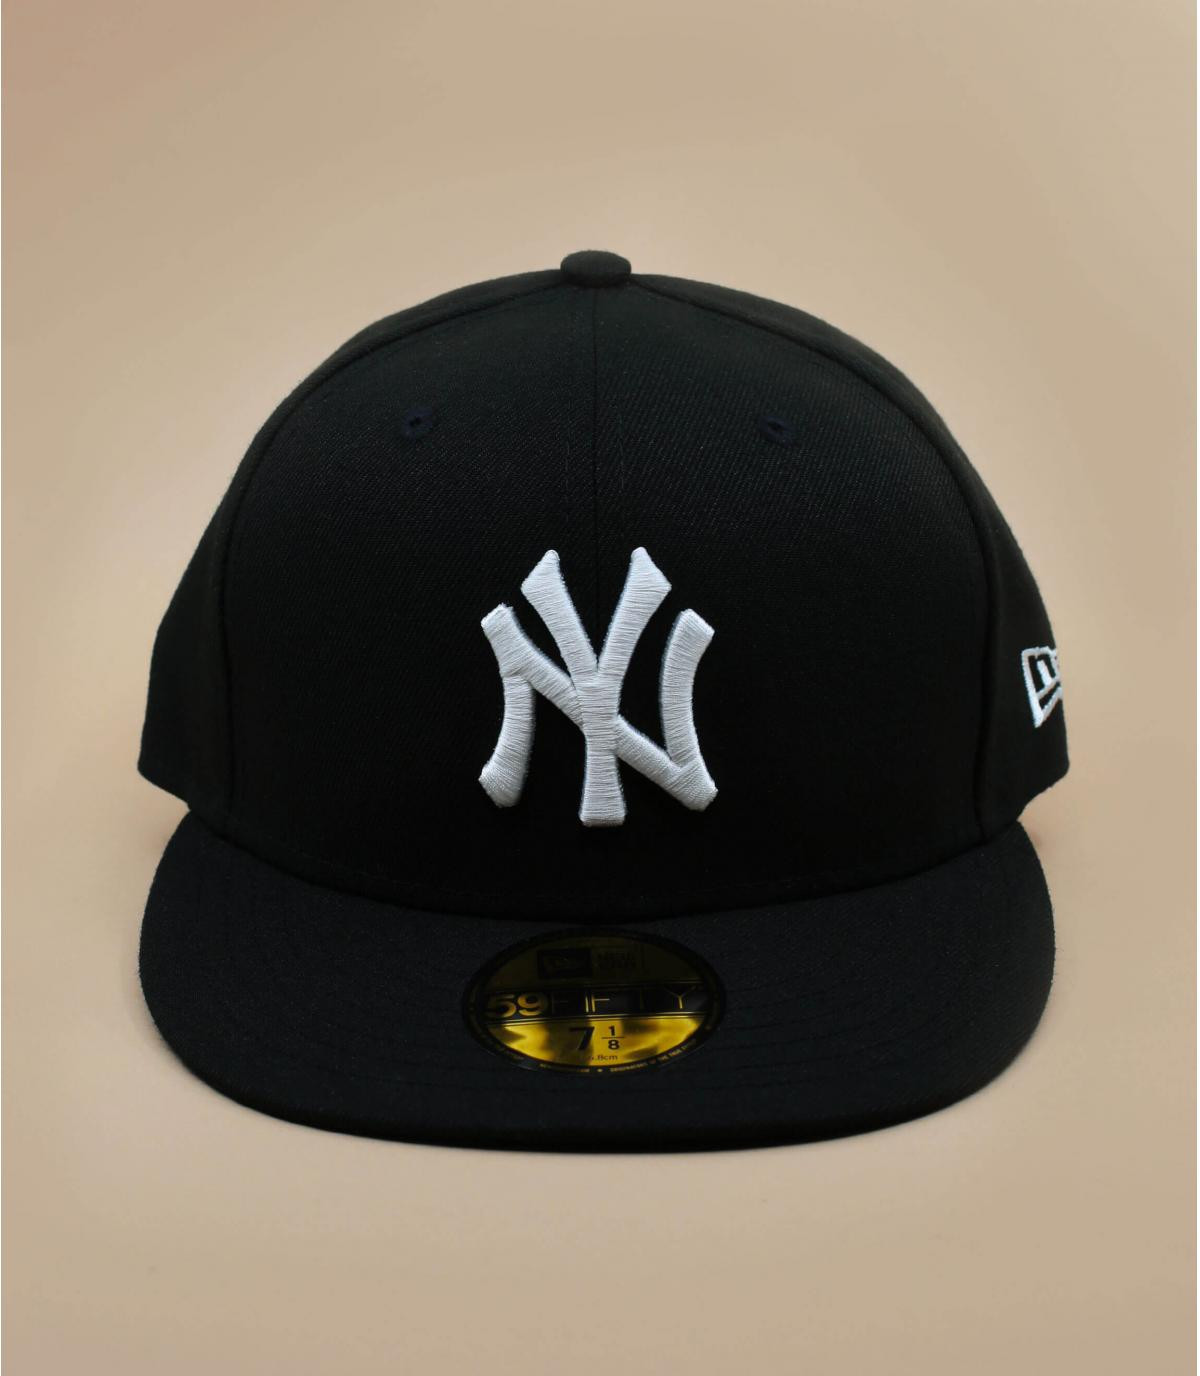 c31f3c46187 ... Détails MLB Basic New York black - image ...